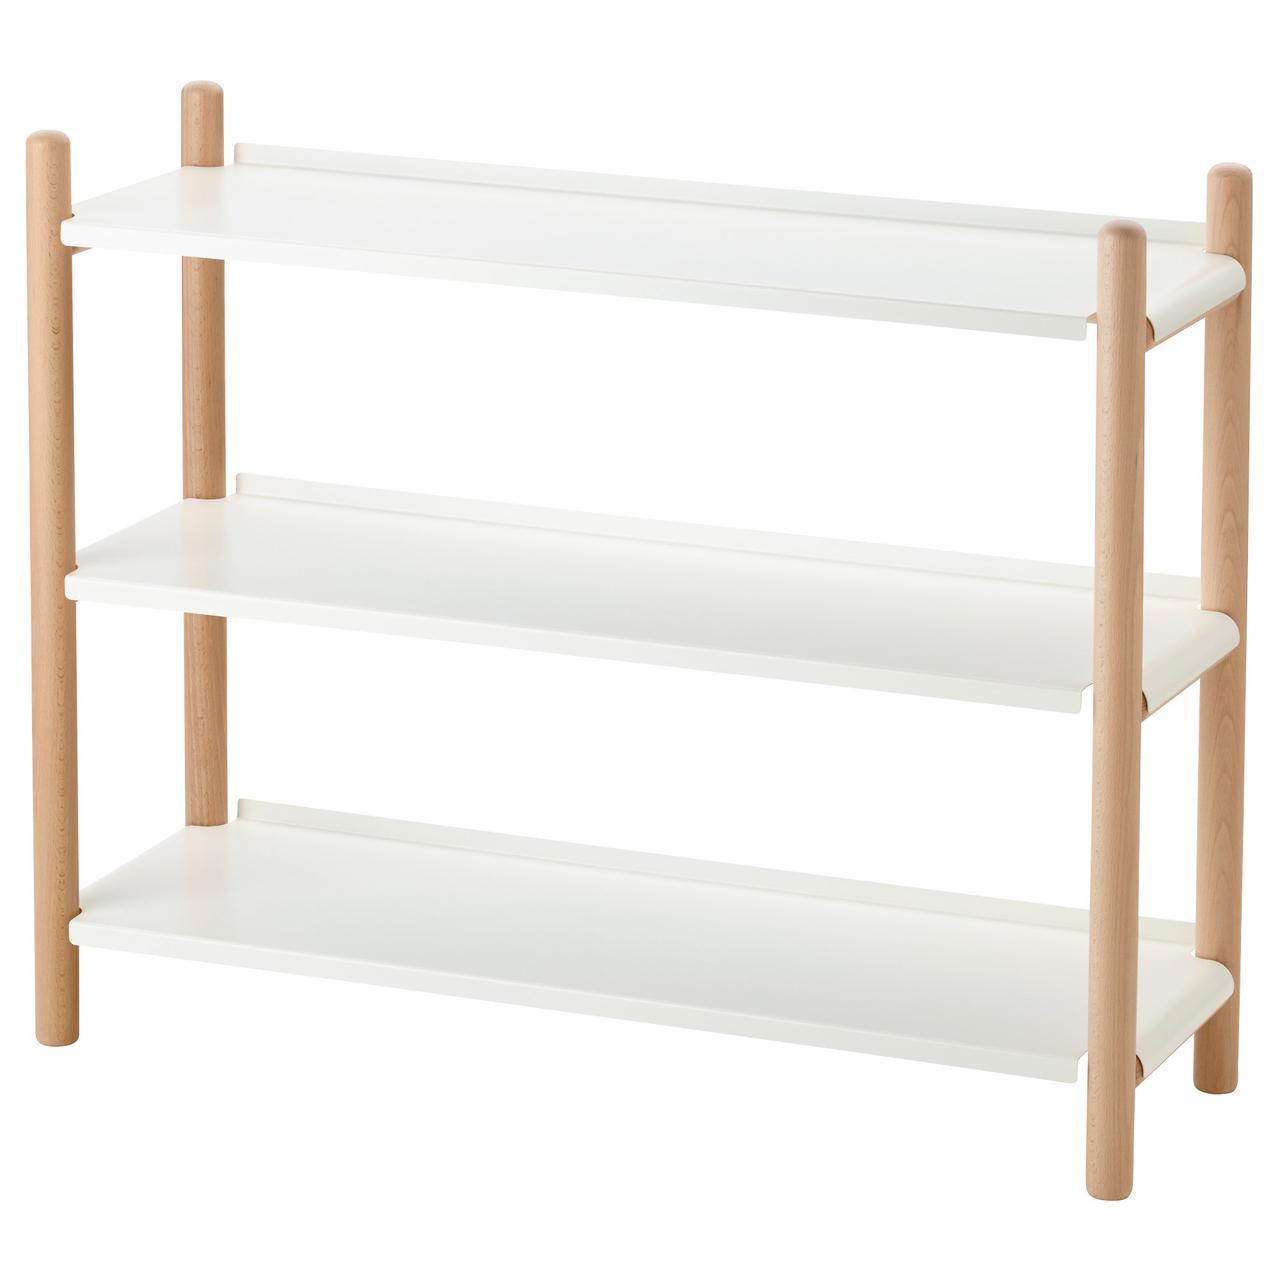 ✅ IKEA IKEA PS 2017 (903.340.56) Набор Полок, бук, белый